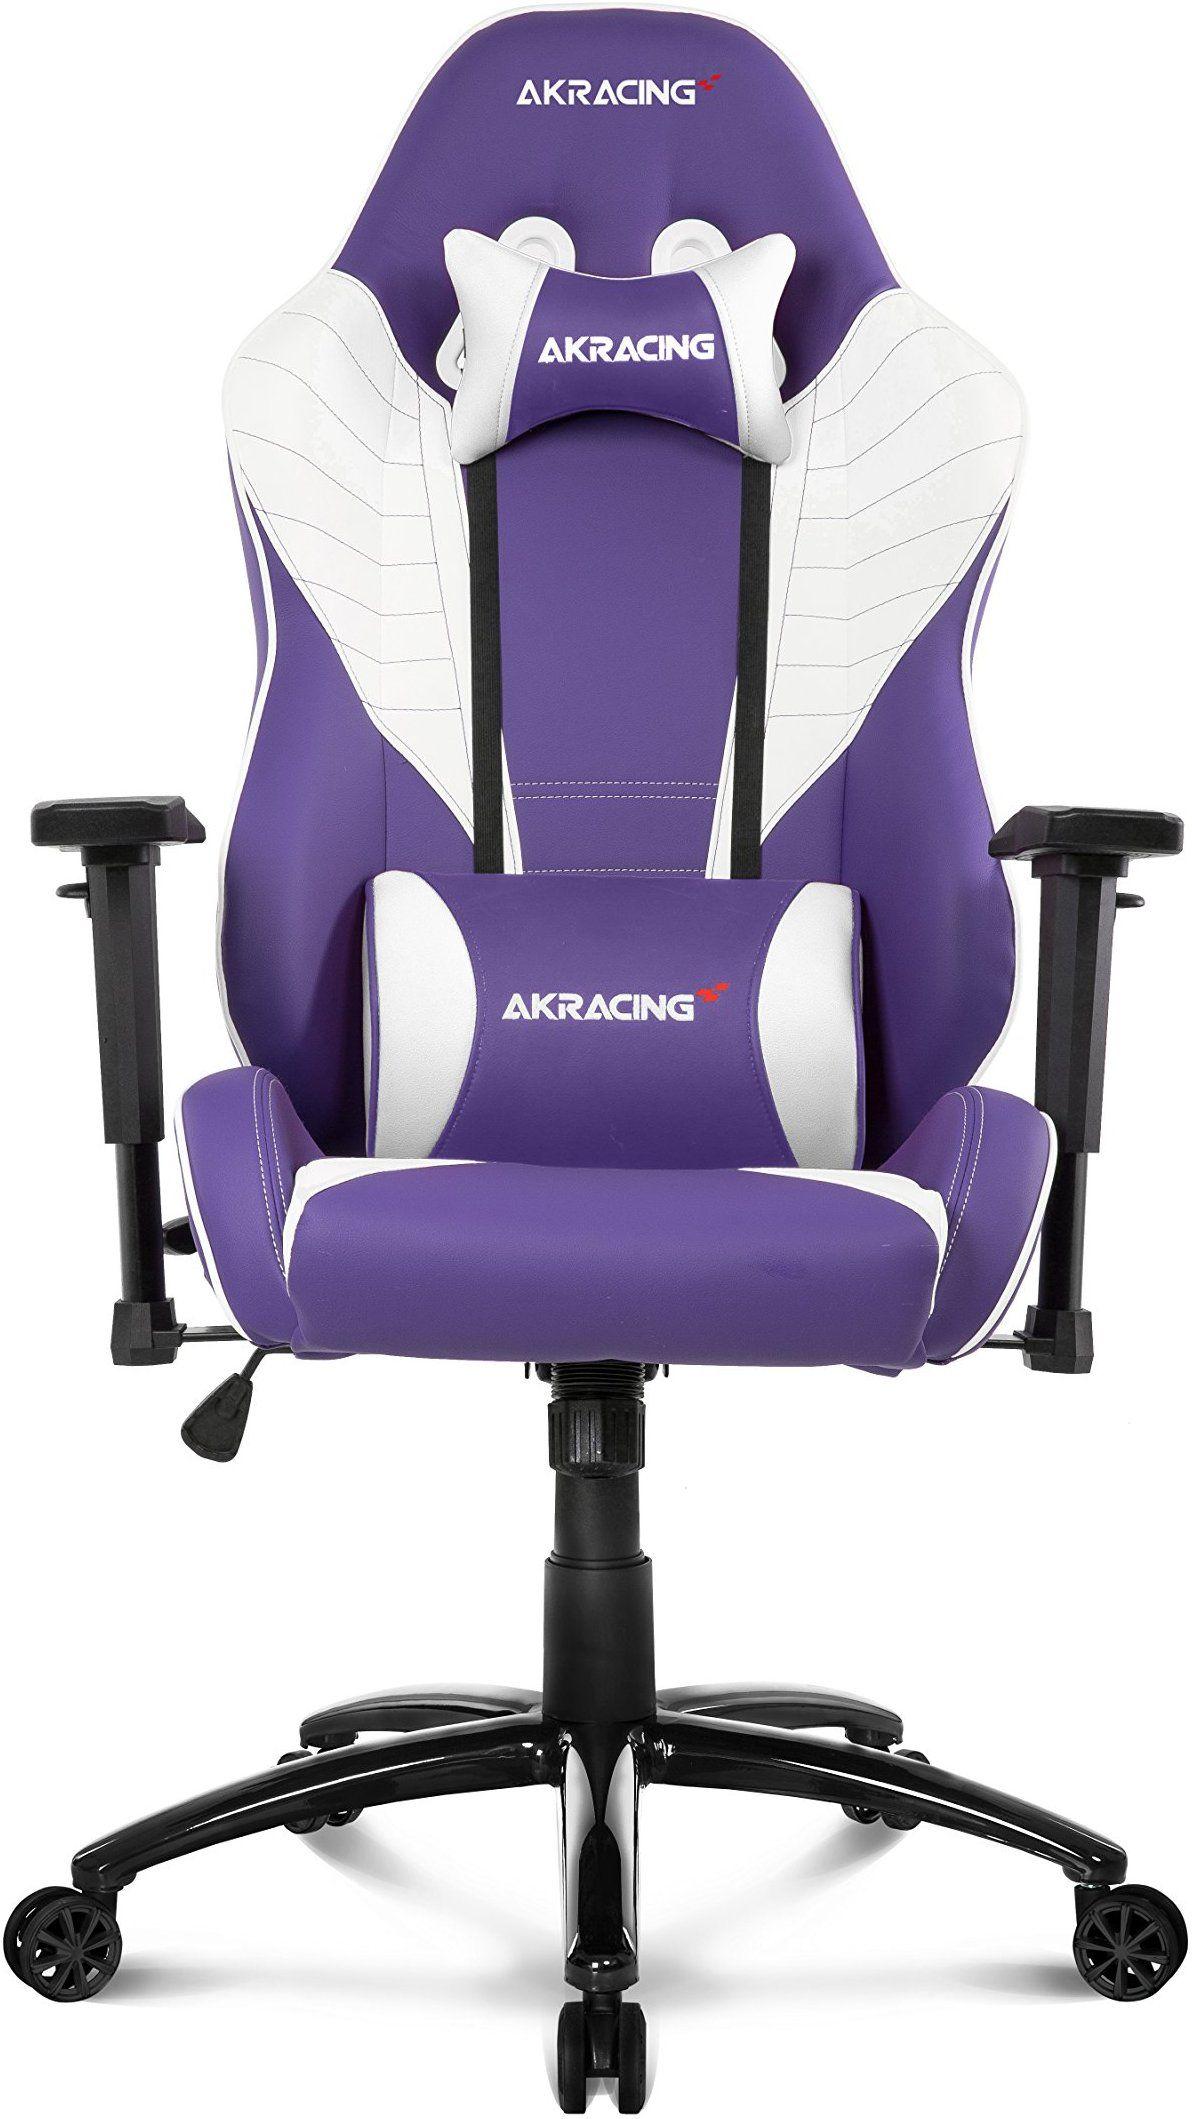 Akracing core series sx gaming chair gaming chair chair